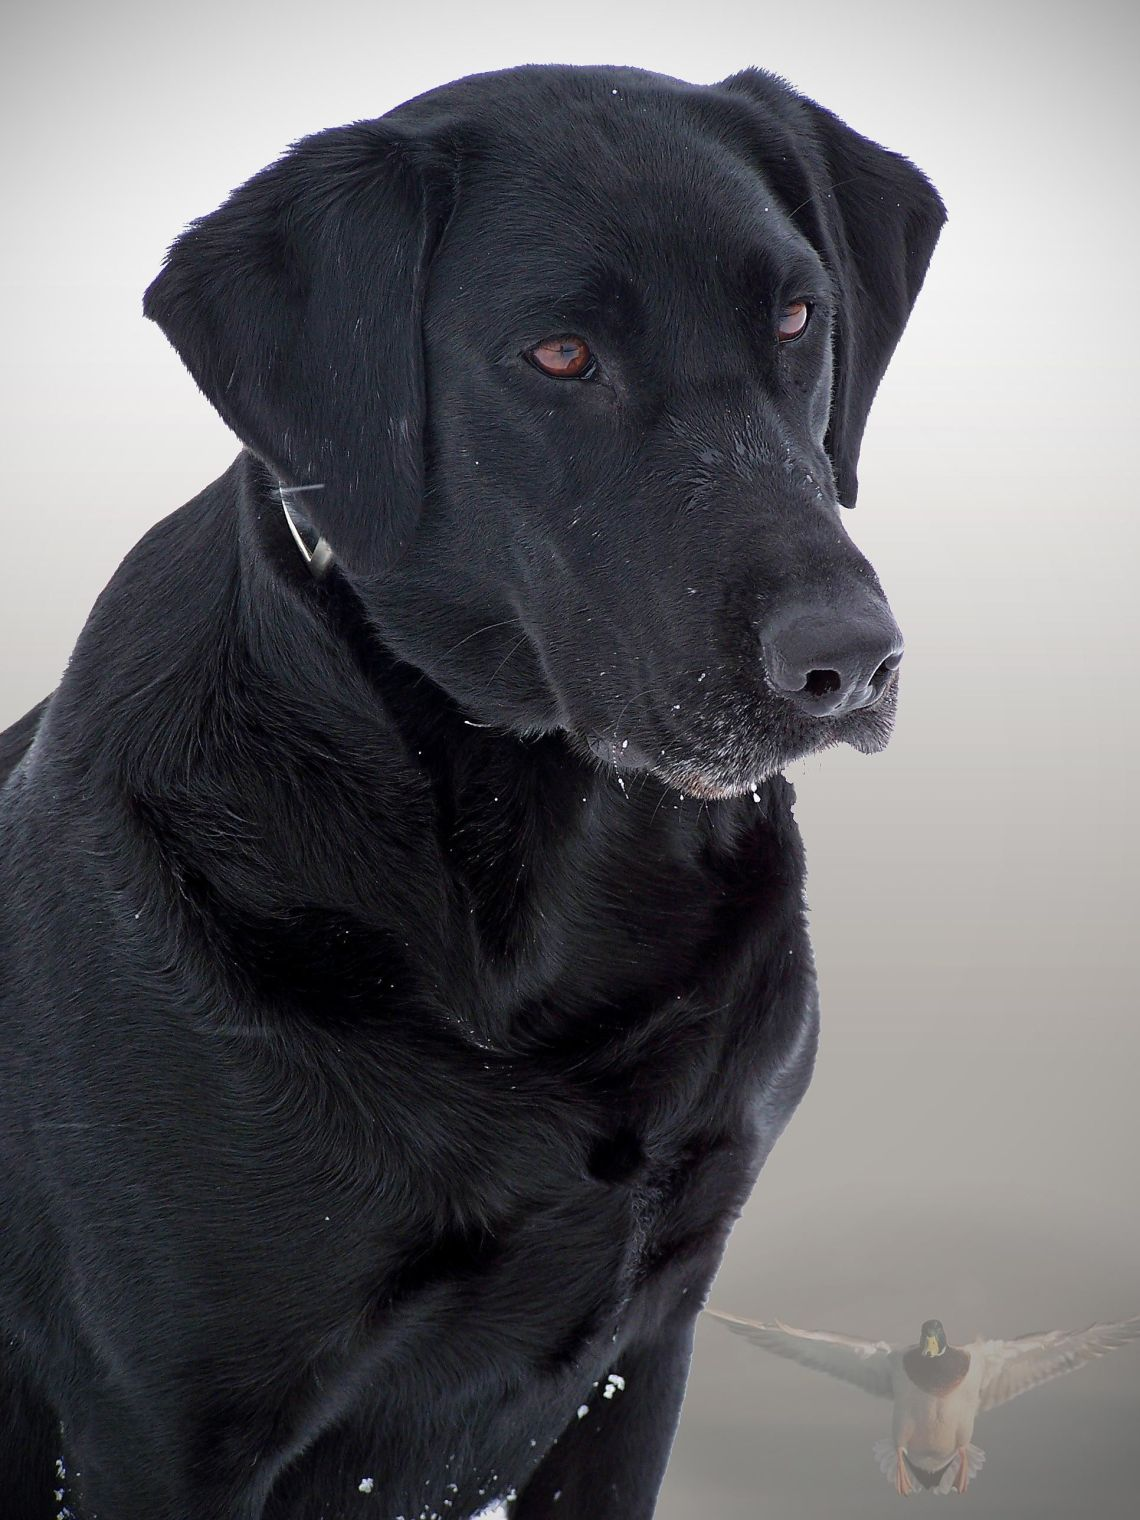 Black dog Pitbull Dog Black And White